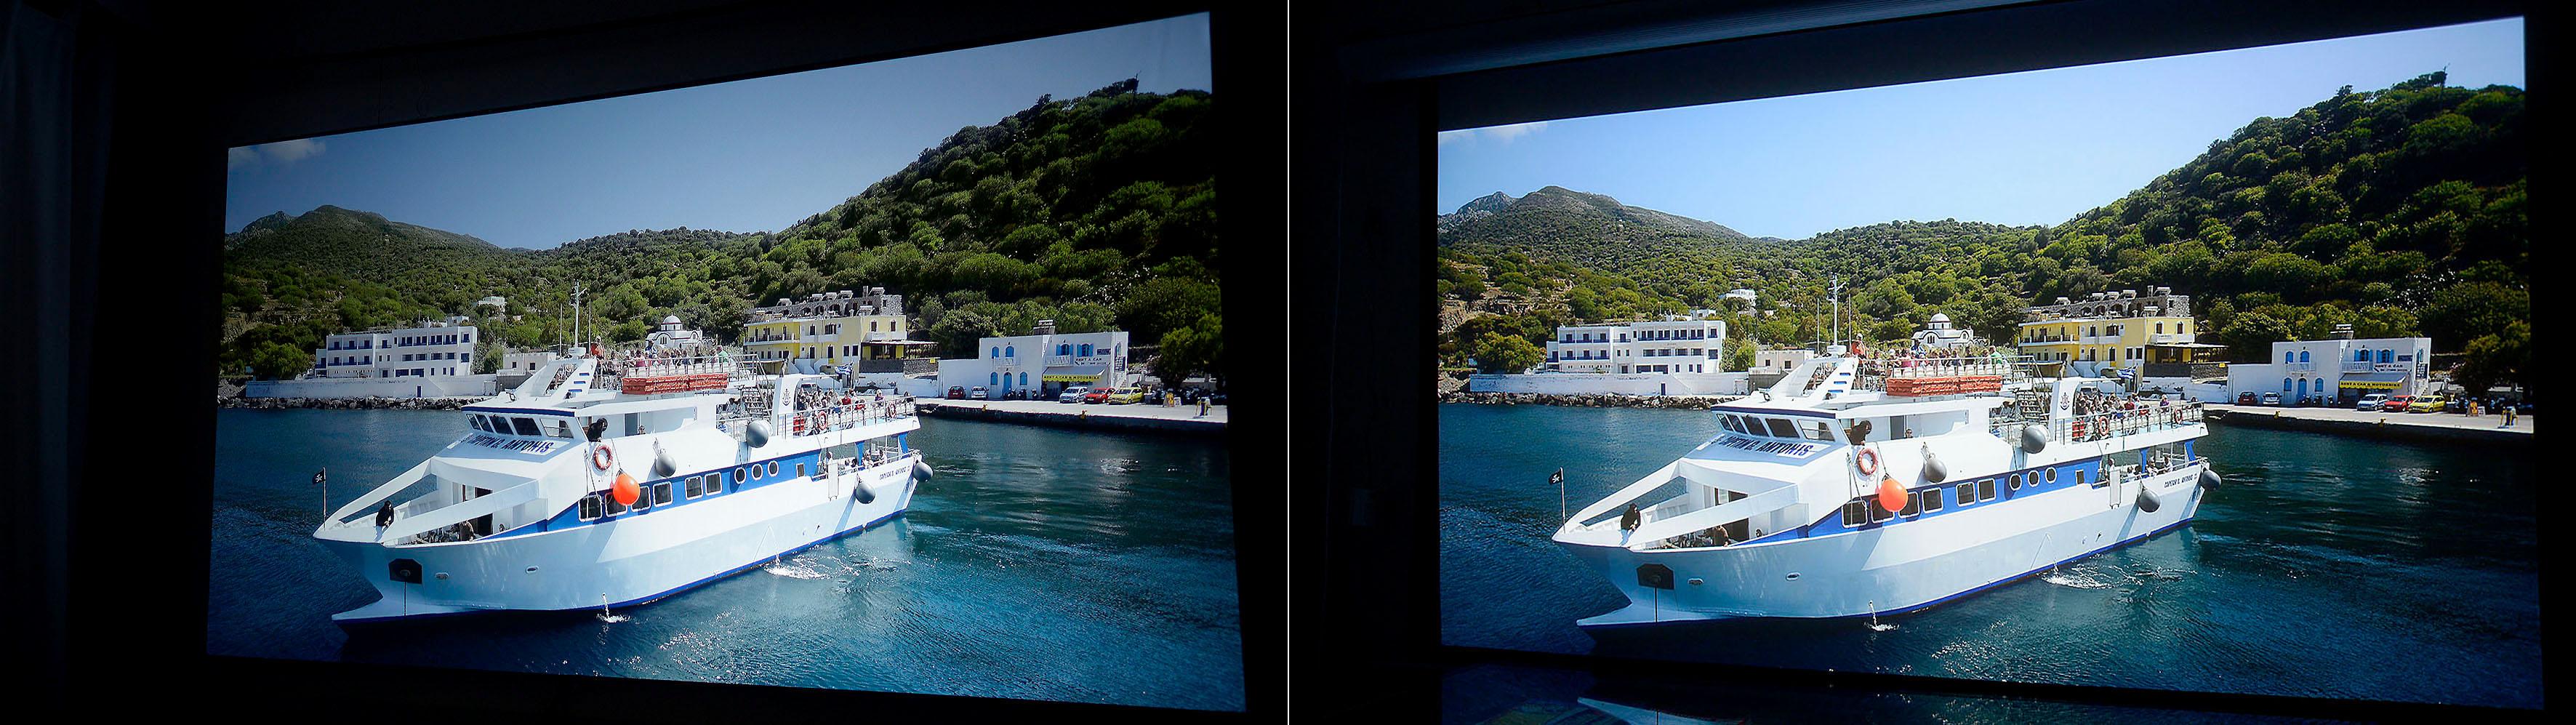 Foto: Michael B. Rehders Links: BenQ W1700 auf Aeon Cinegrey 3D Rechts: JVC DLA-X5500 auf Saker Tab Tension